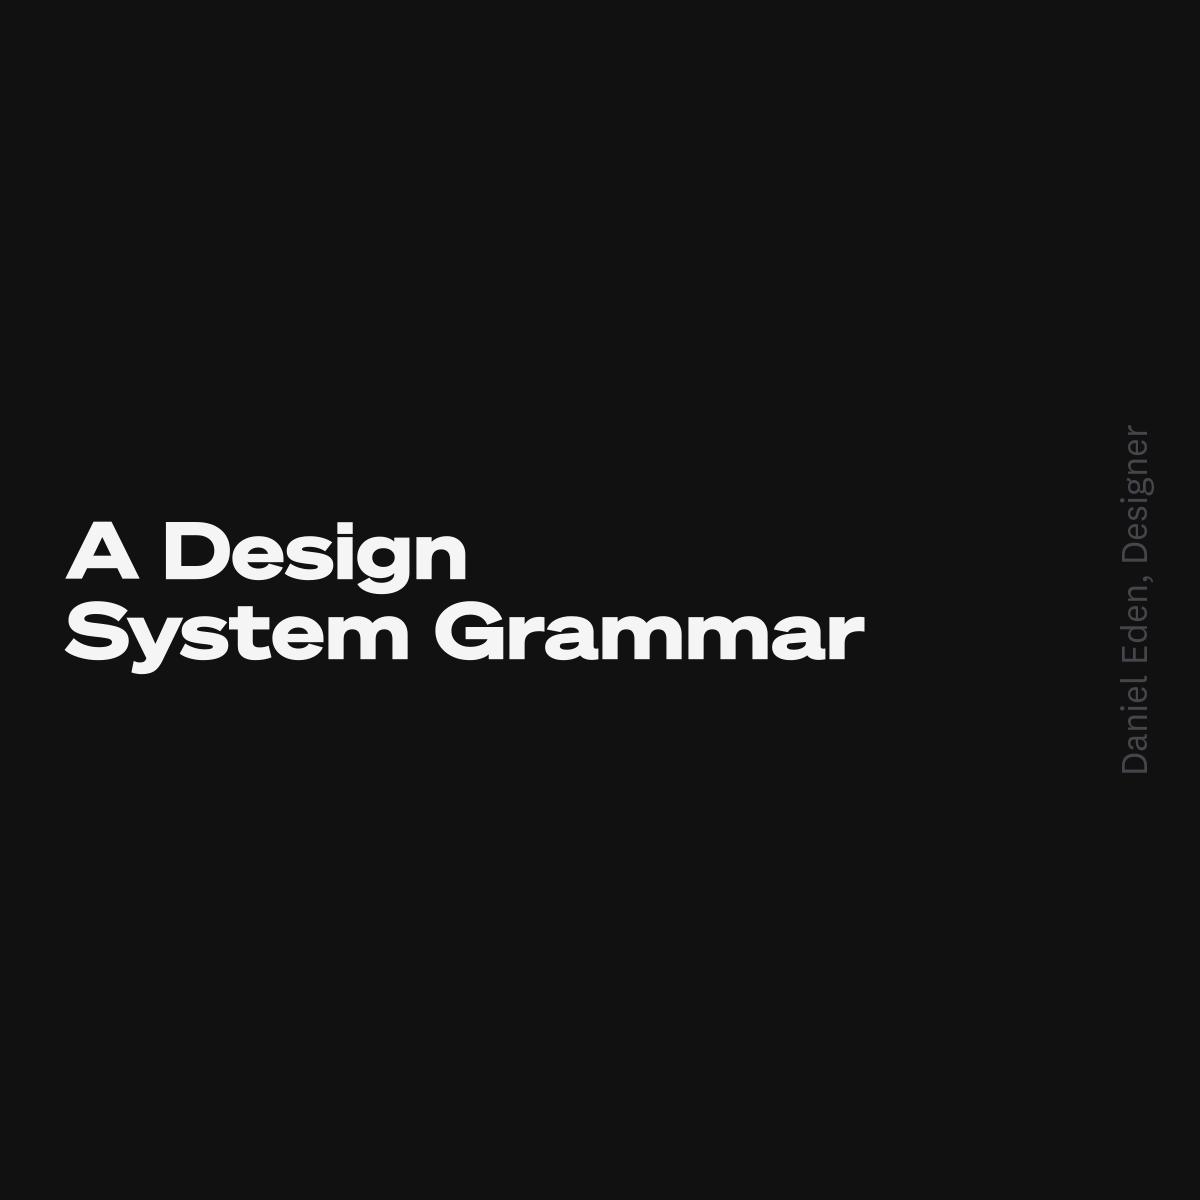 A Design System Grammar   Daniel T. Eden, Designer